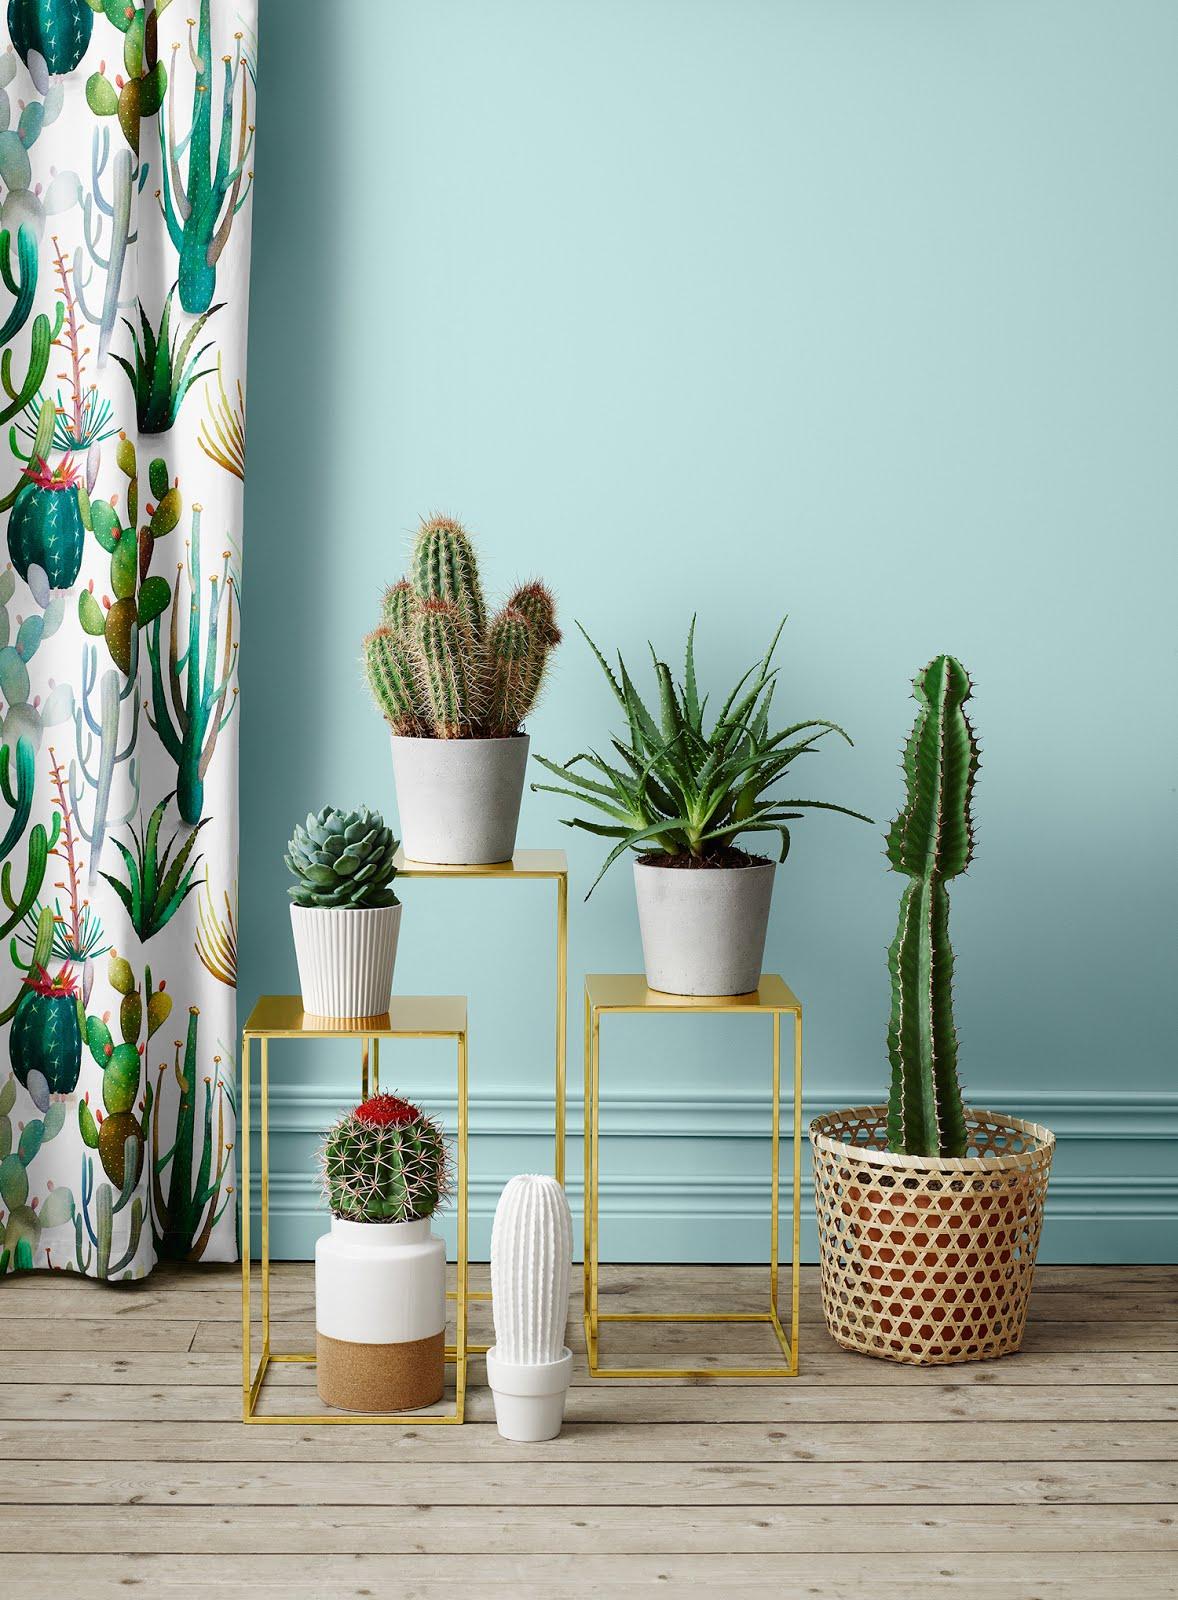 Tendenze arredo 2017 piante in casa 1 cactus mania for Piante in casa